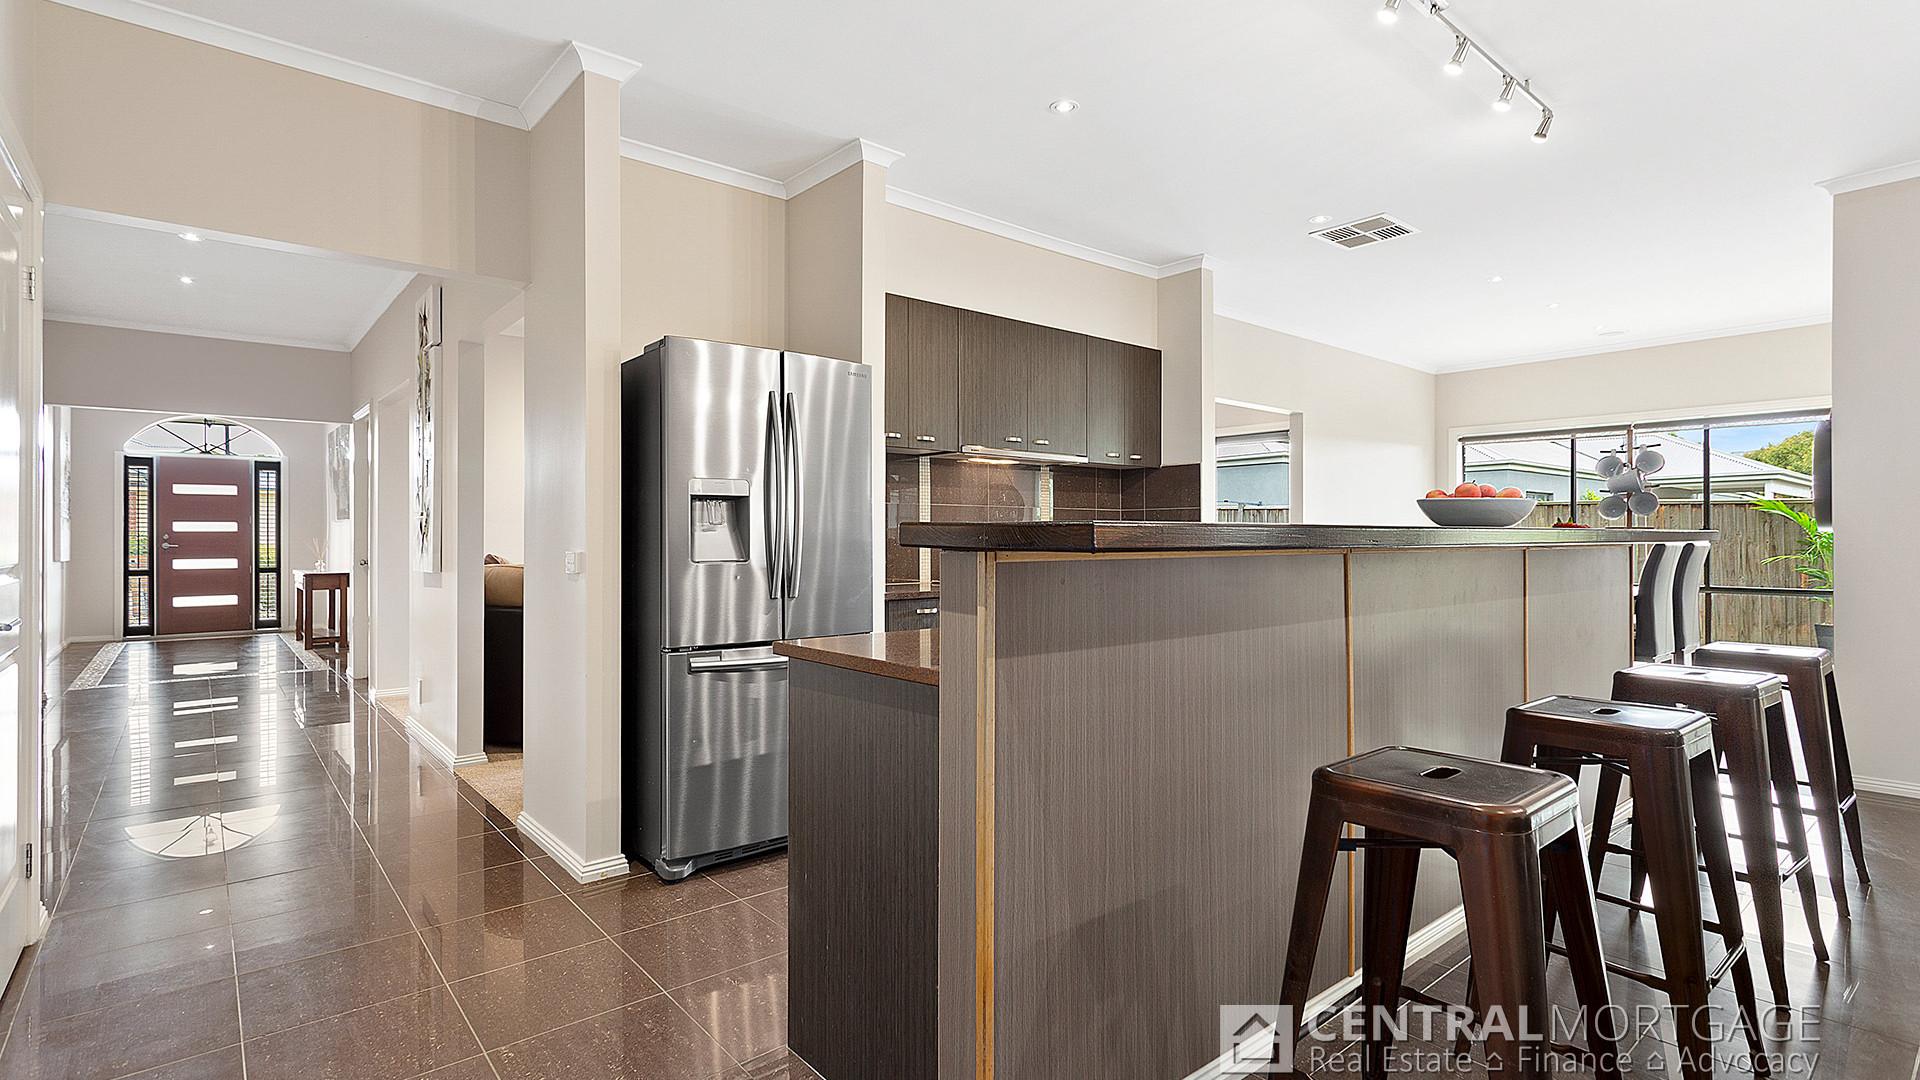 New Kitchen mortgage